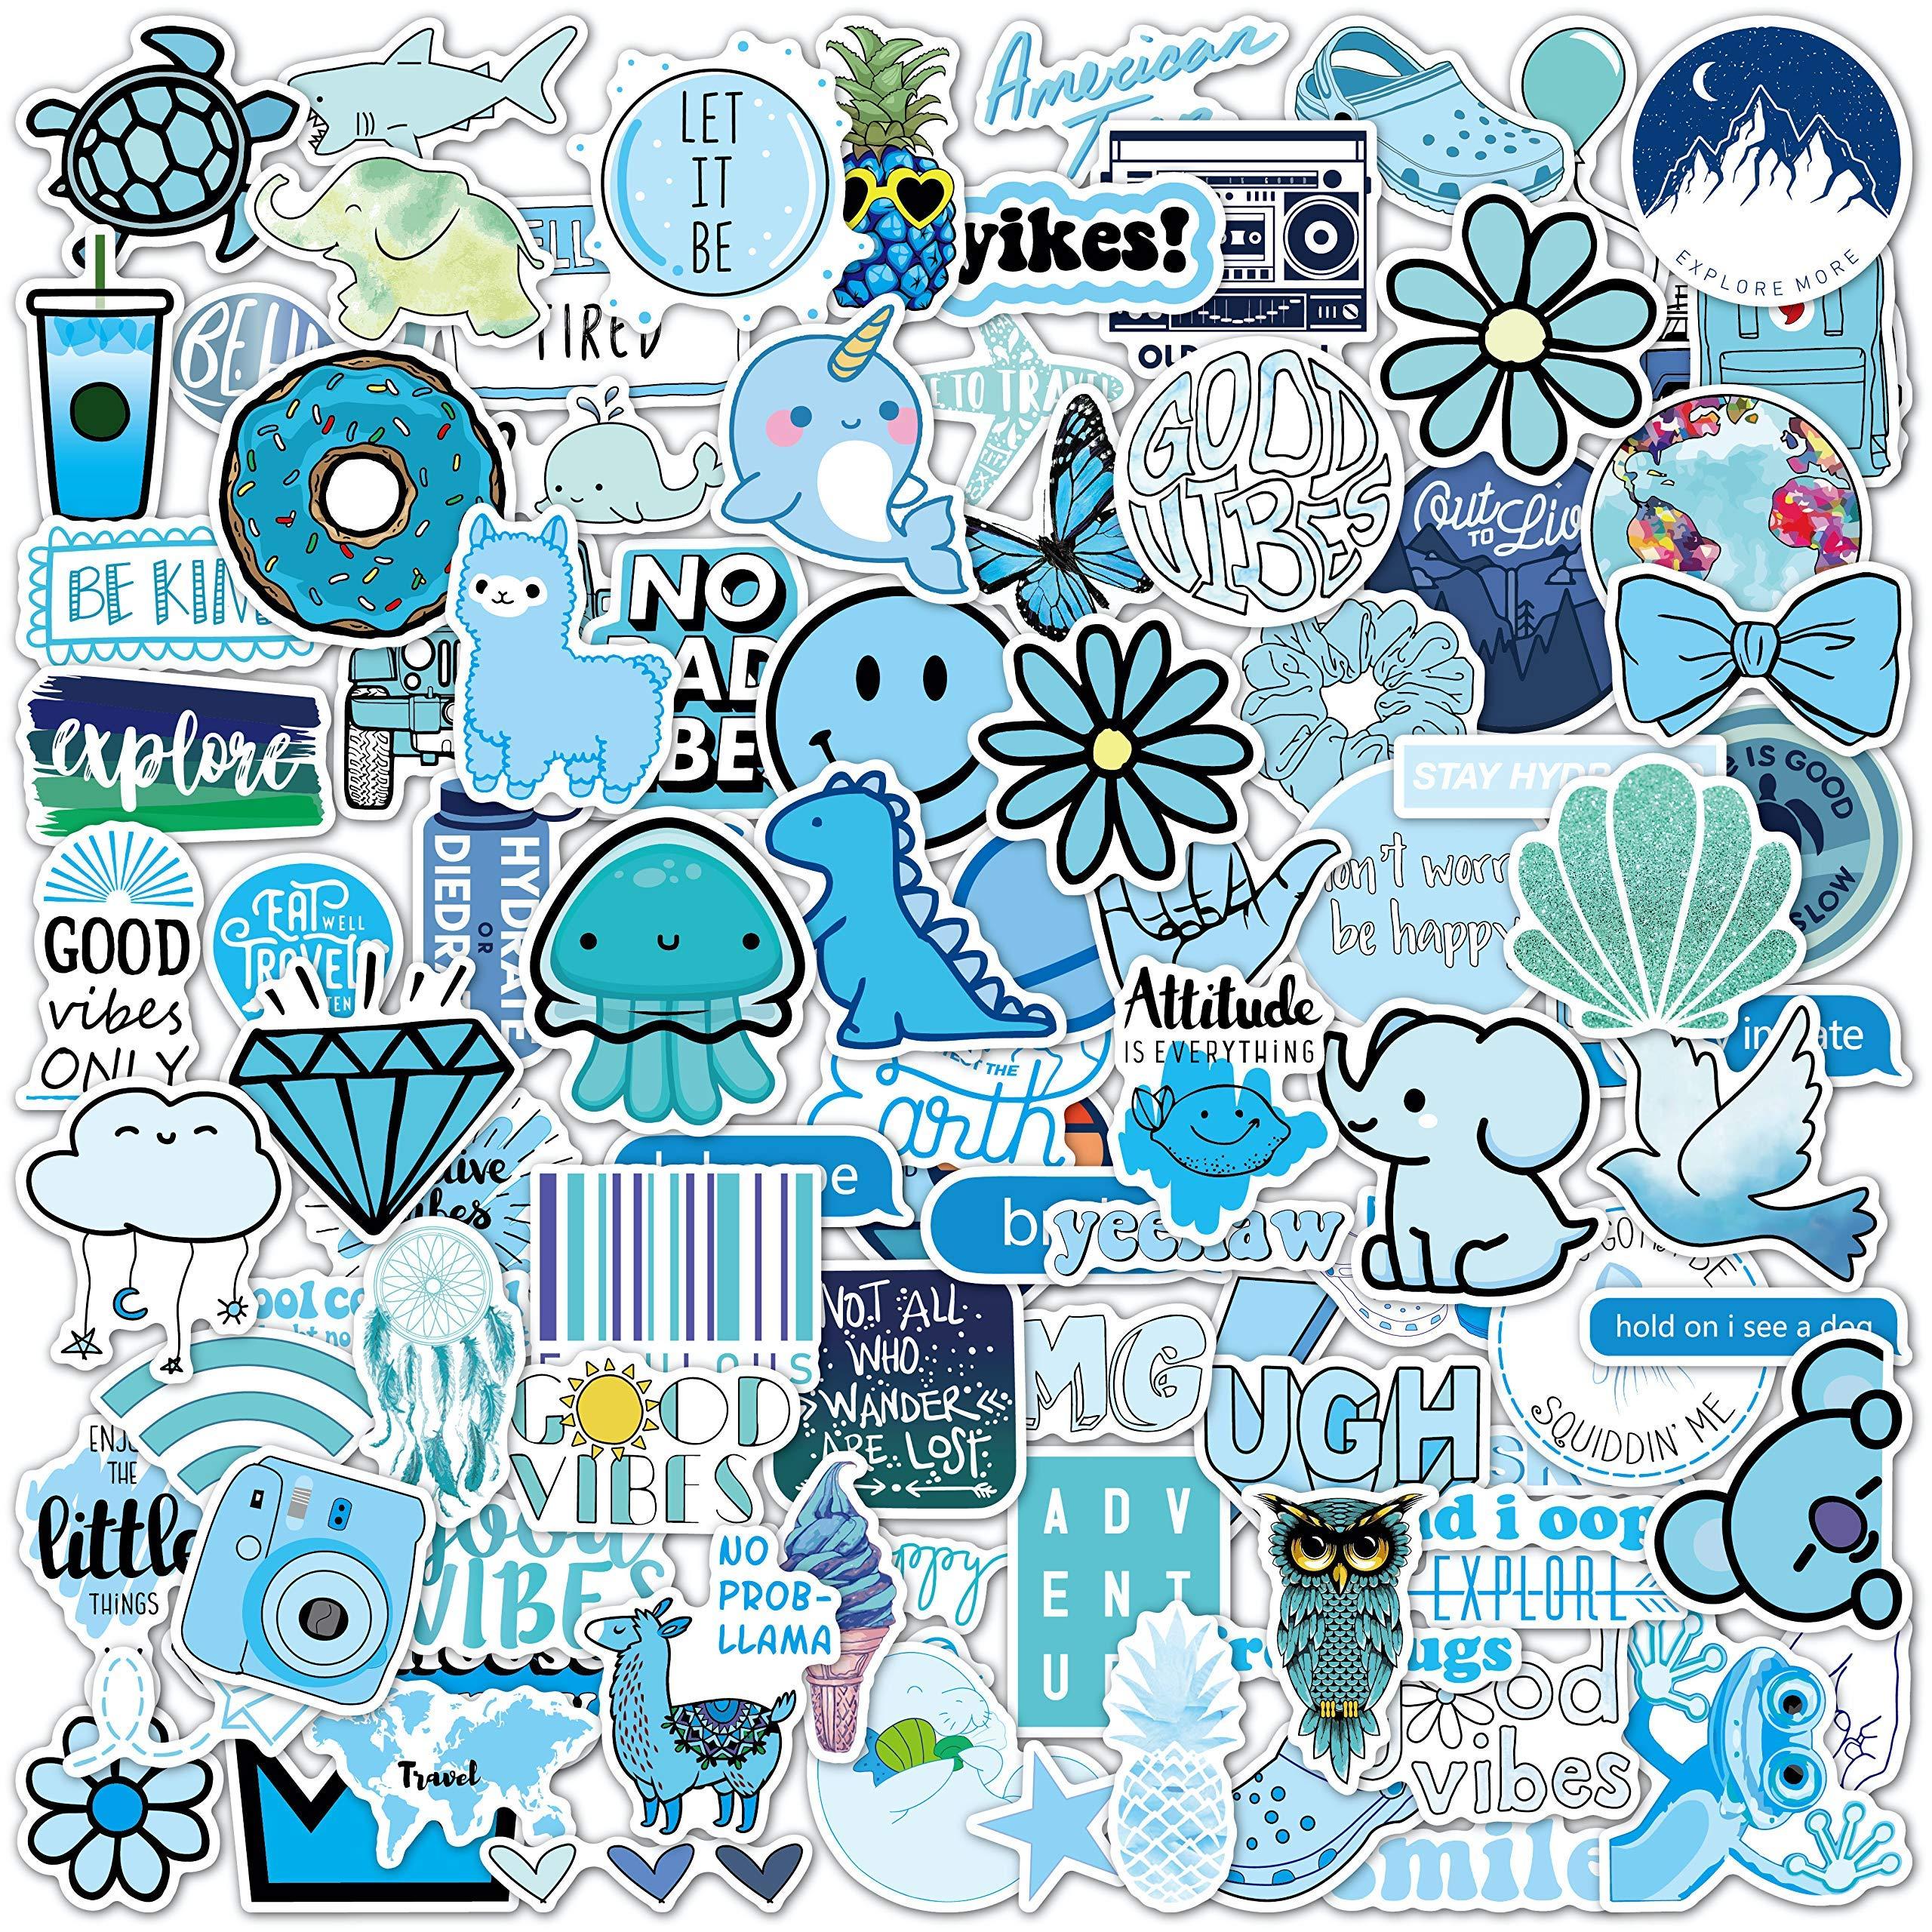 100 Blue VSCO Stickers, Aesthetic Stickers, Cute Stickers, Laptop Stickers, Vinyl stickers, Stickers for Water Bottles, Waterproof stickers for kids teen girls, Christmas teen girl gifts sticker packs